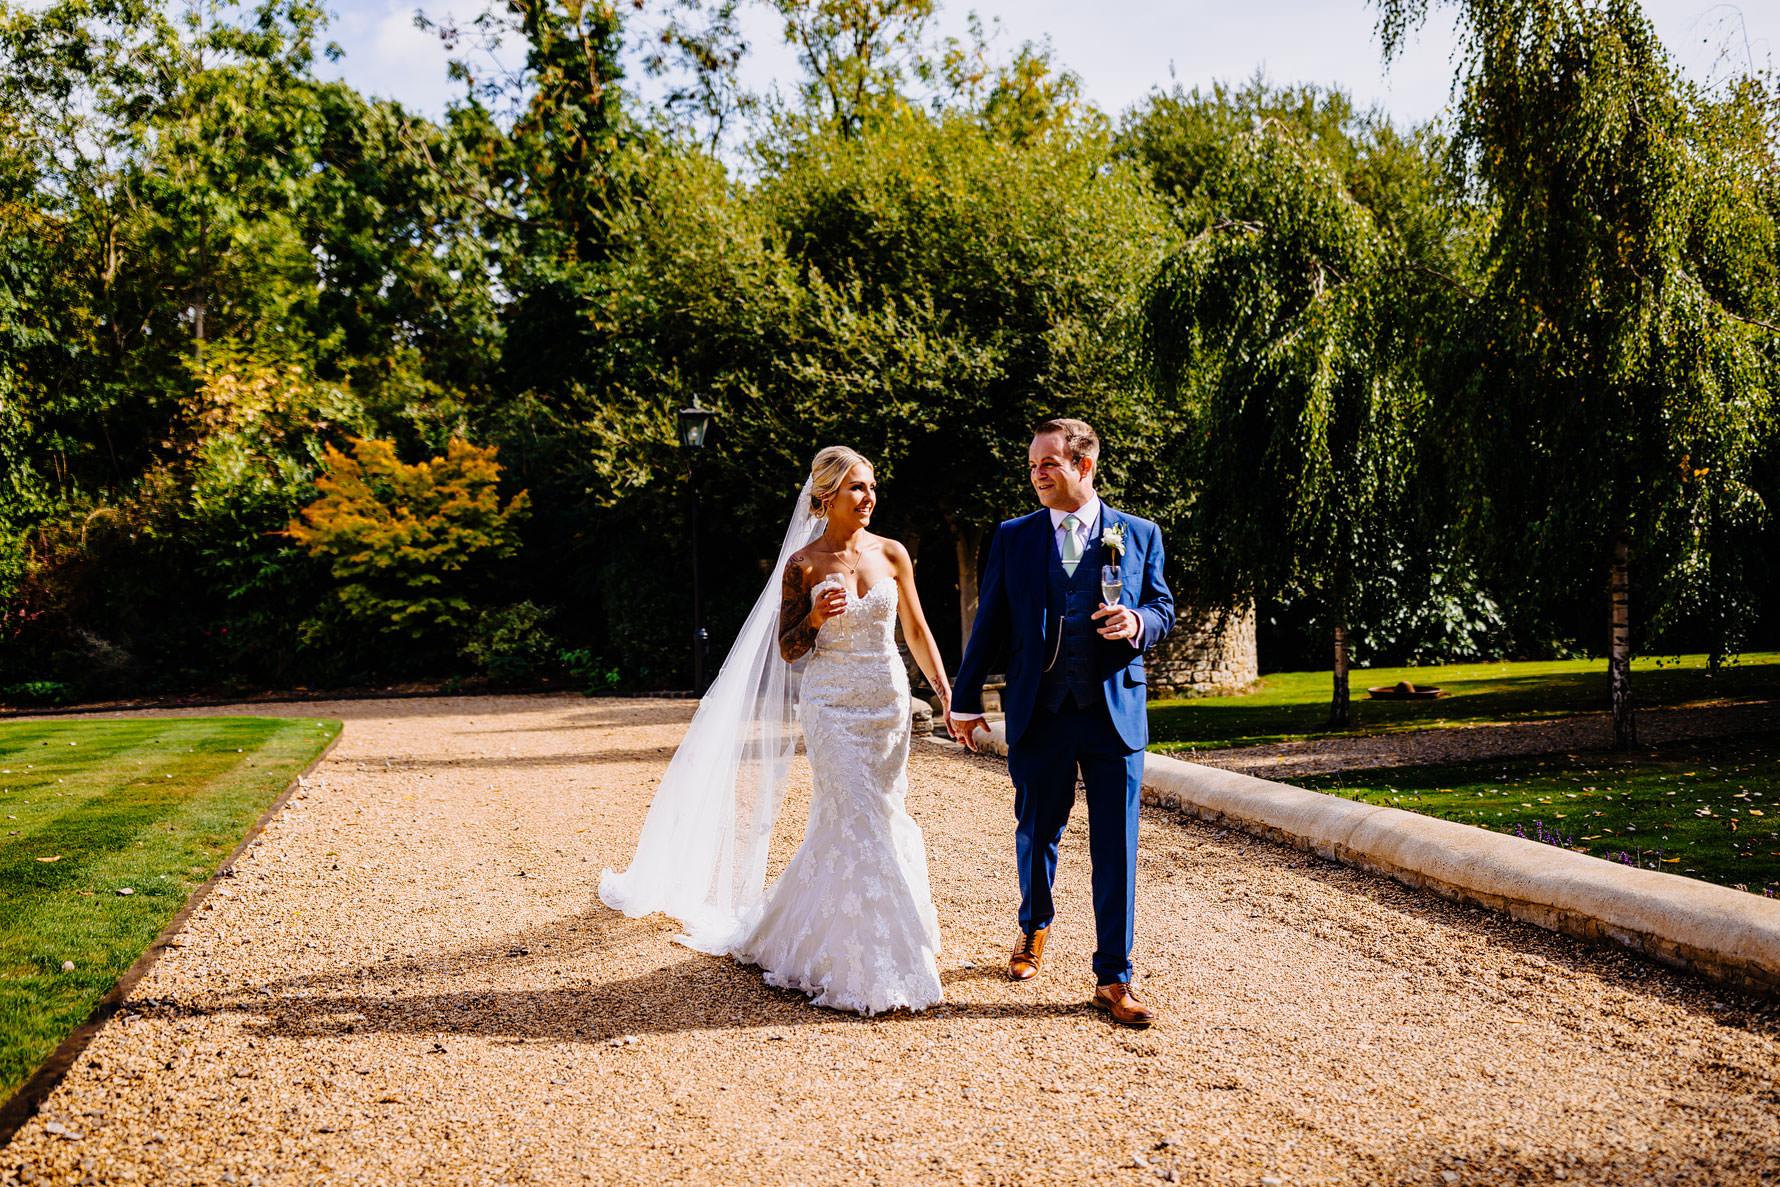 a bride and groom take a walk